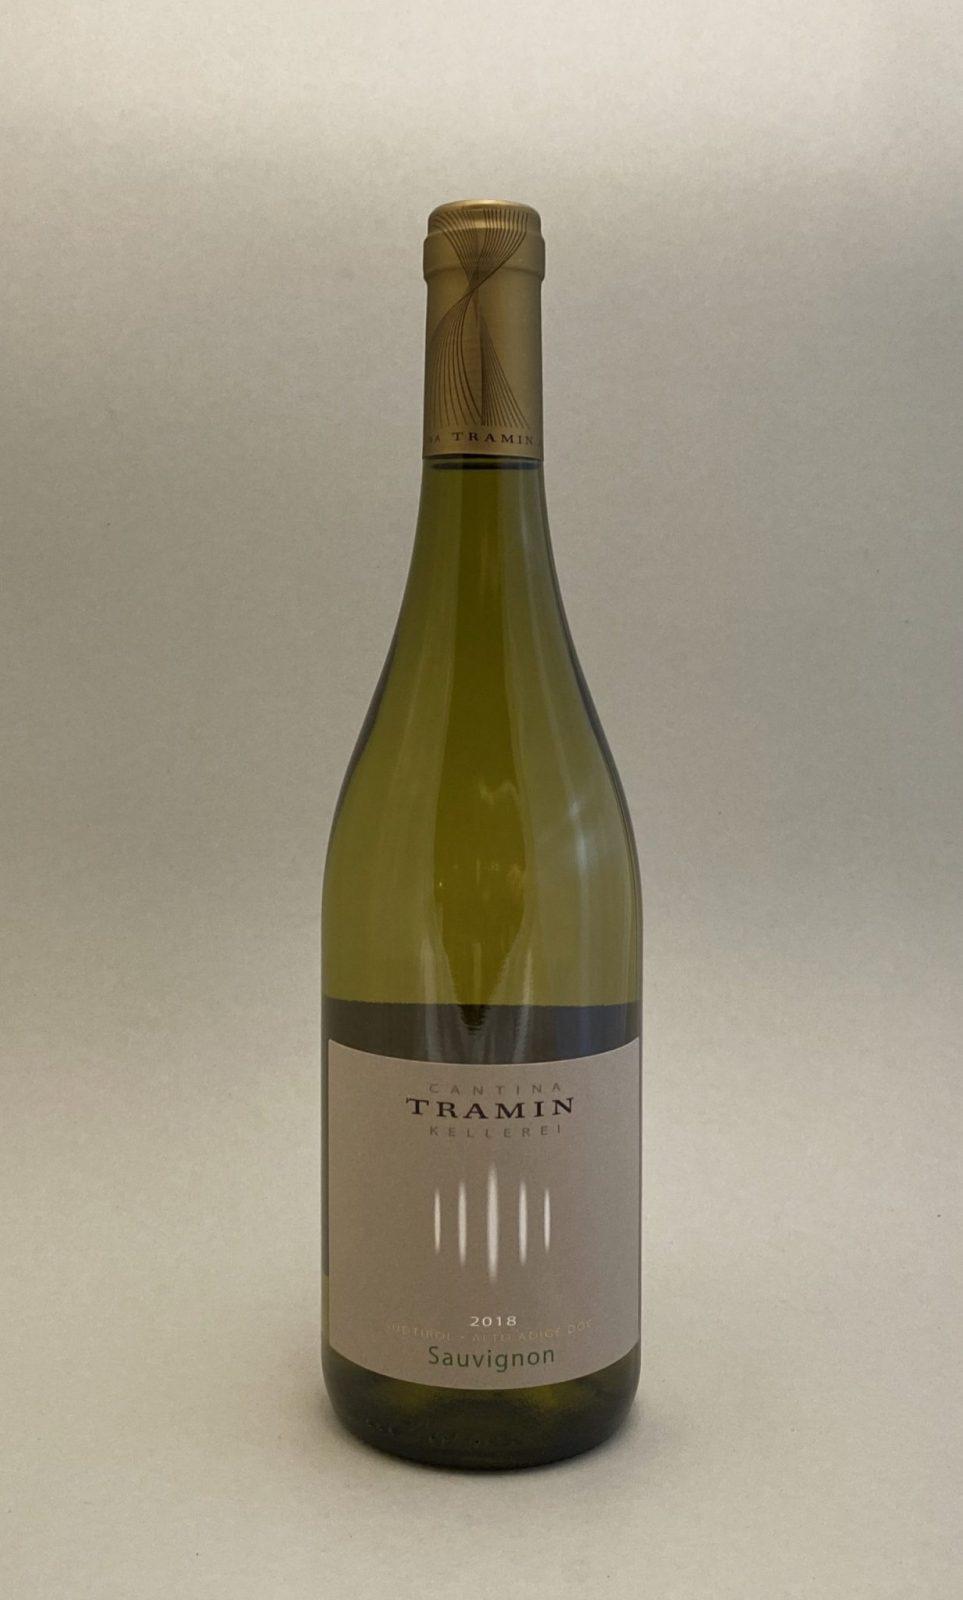 TRAMIN Sauvignon 2018, vinoteka Sunny wines slnecnice mesto, Bratislava petrzalka, vino biele z Talianska